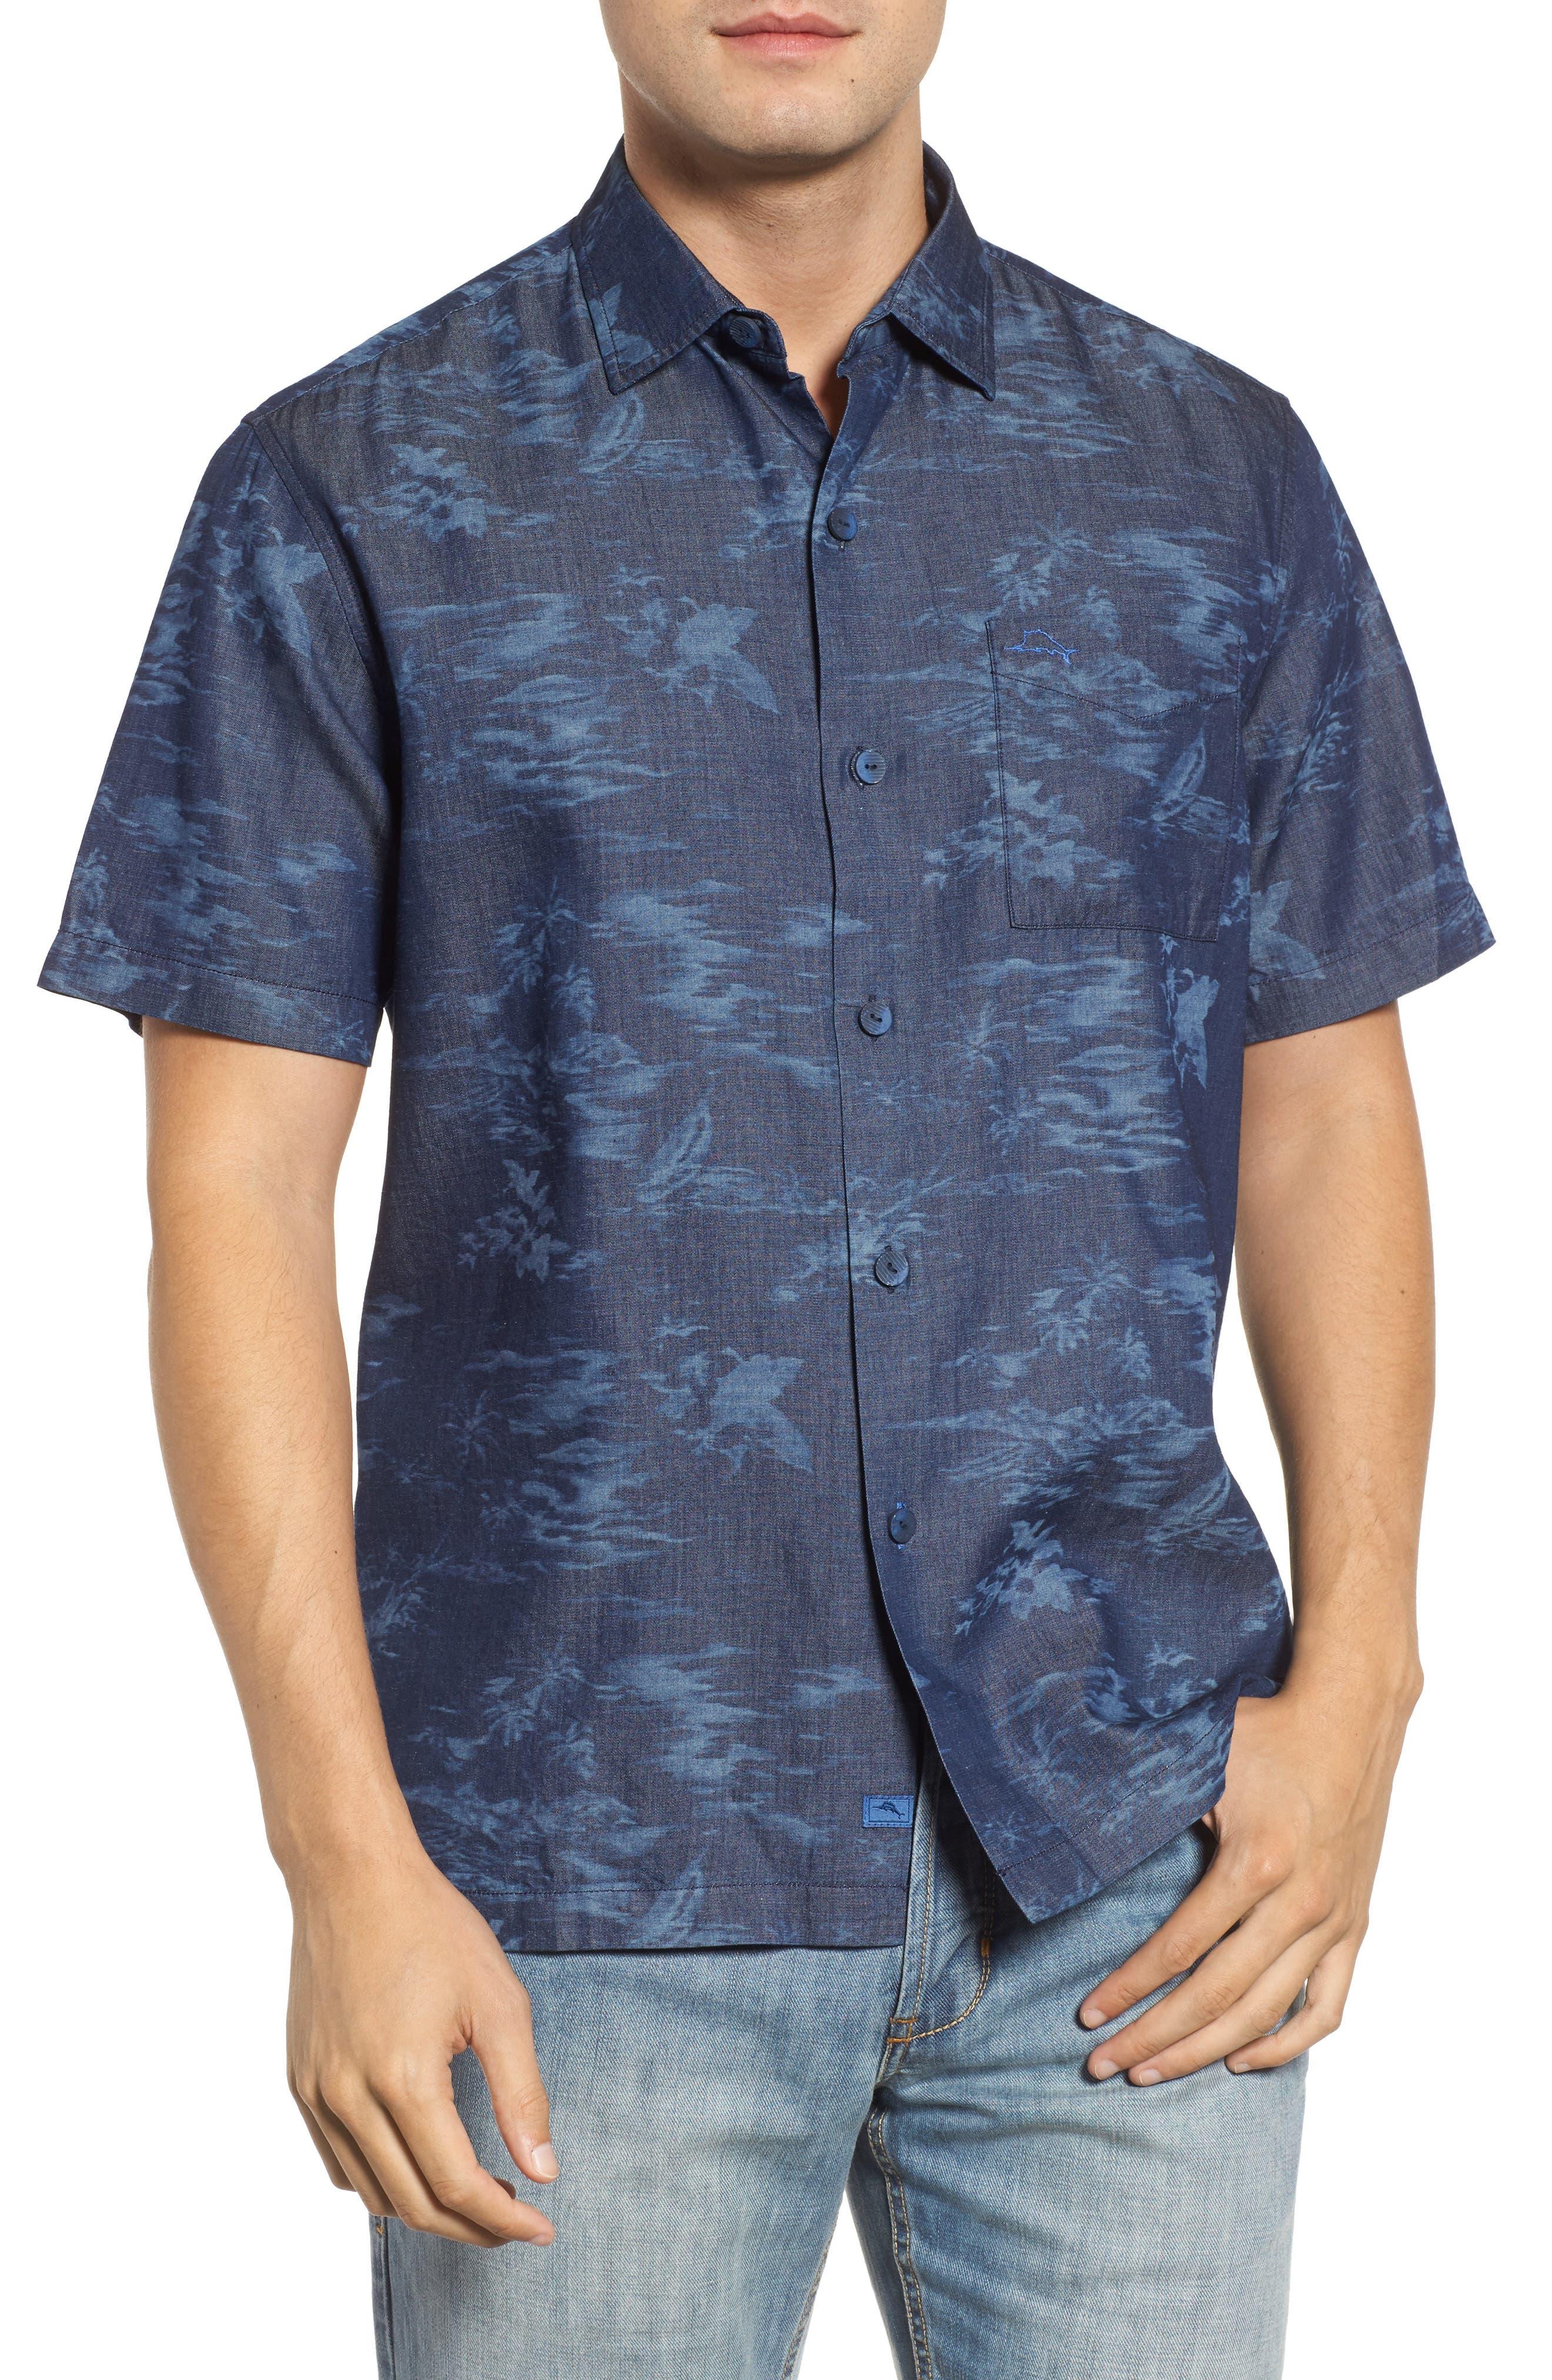 South Beach Scenic Sport Shirt,                             Main thumbnail 1, color,                             Indigo